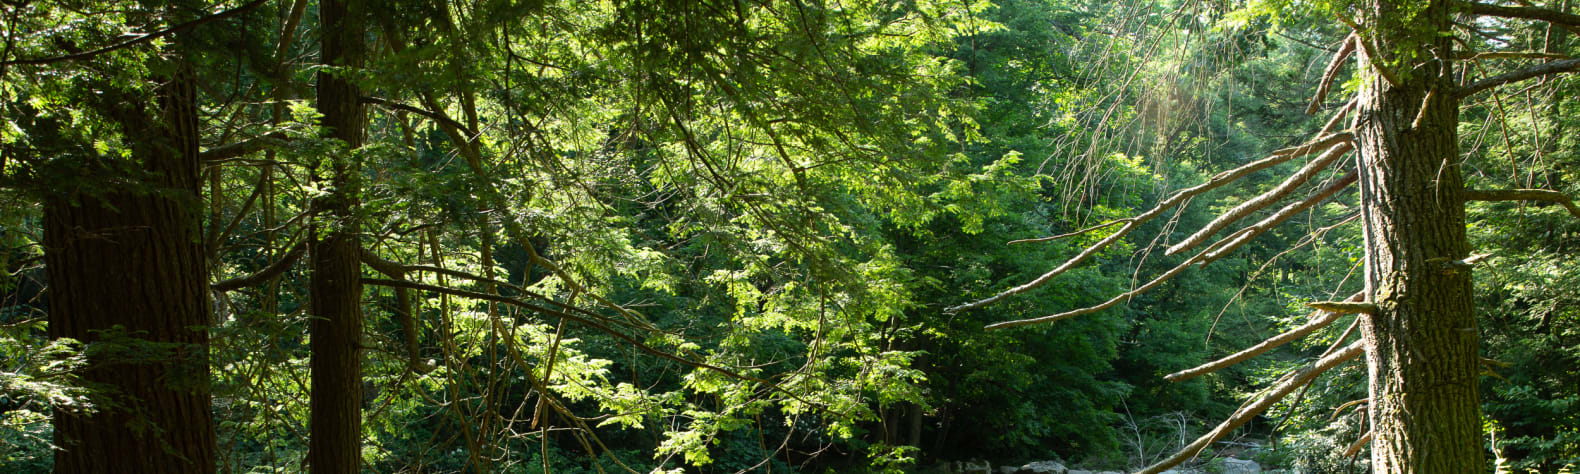 Abrams Creek Campground/Retreat